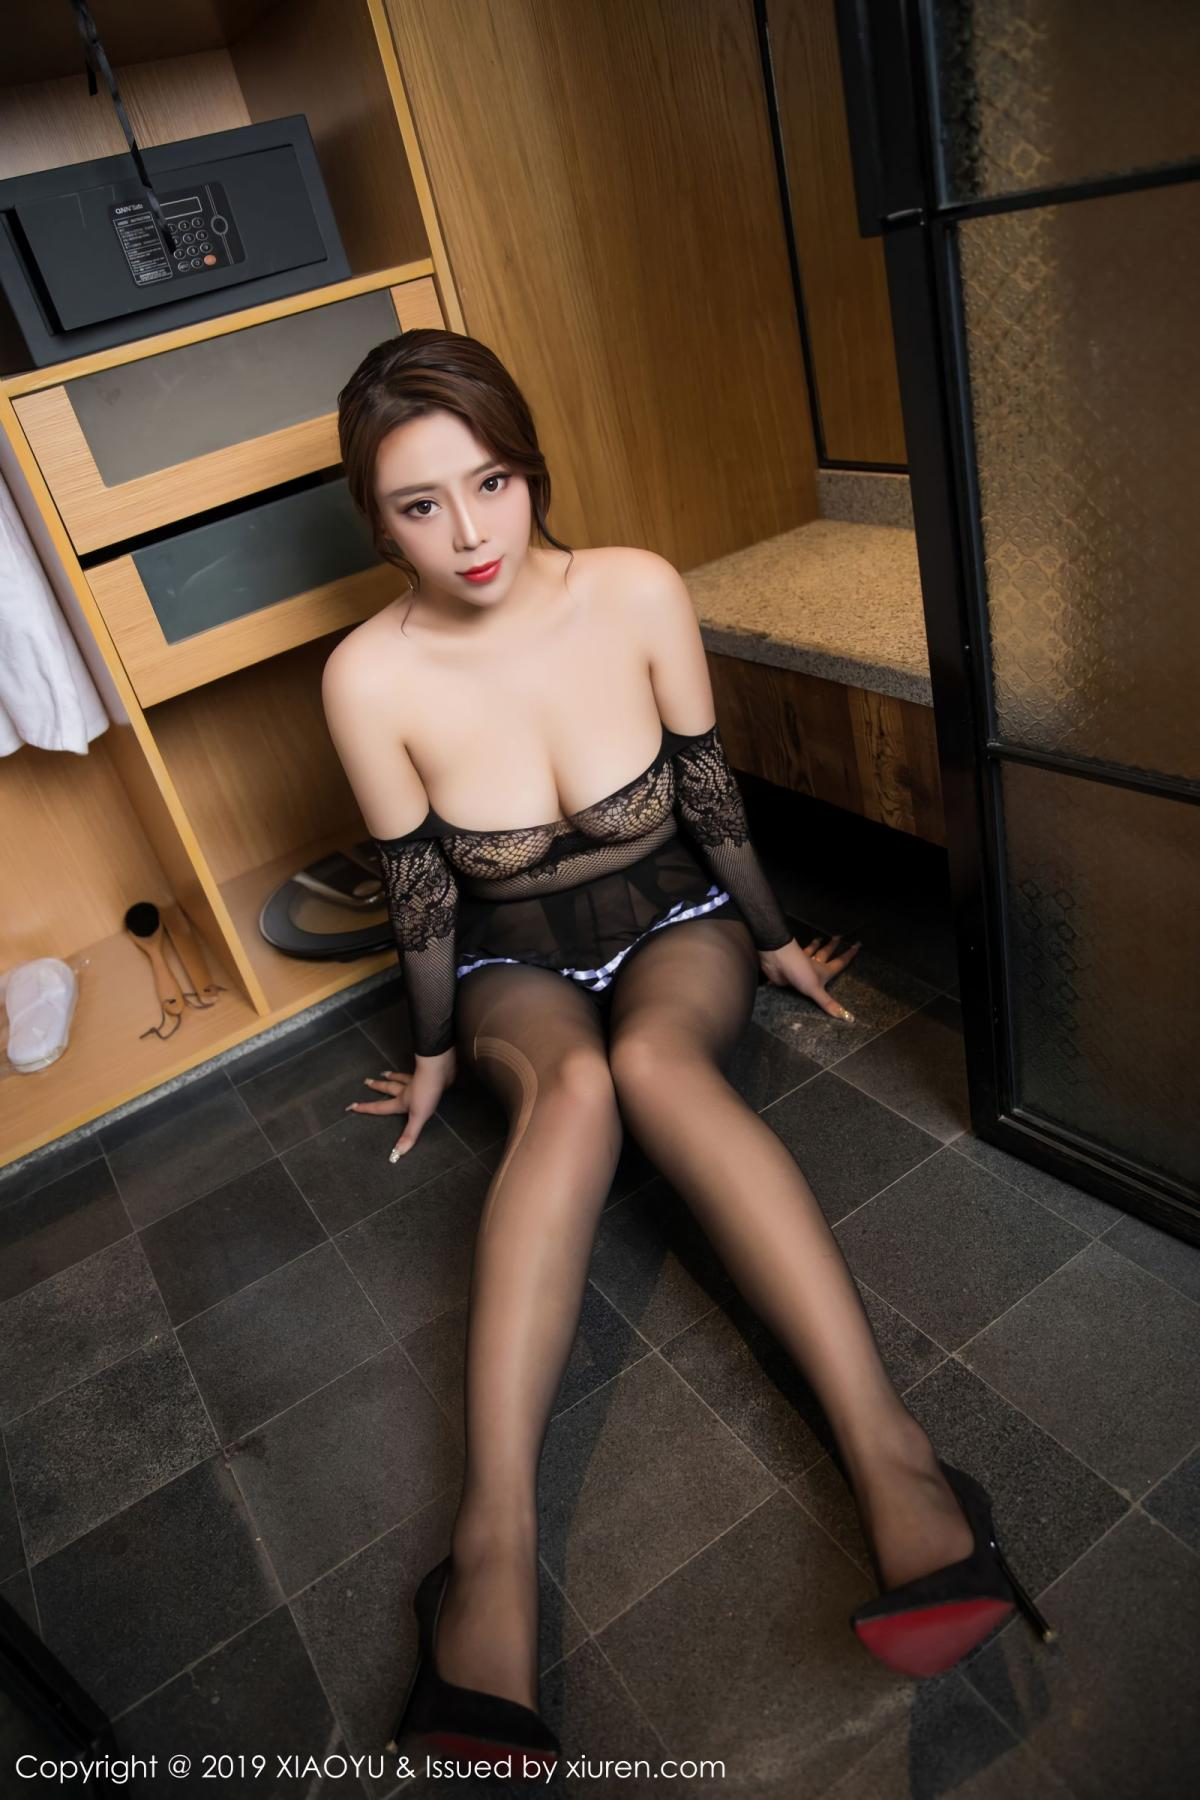 [XiaoYu] Vol.016 Miki Tu 25P, Miki Tu, Tall, XiaoYu